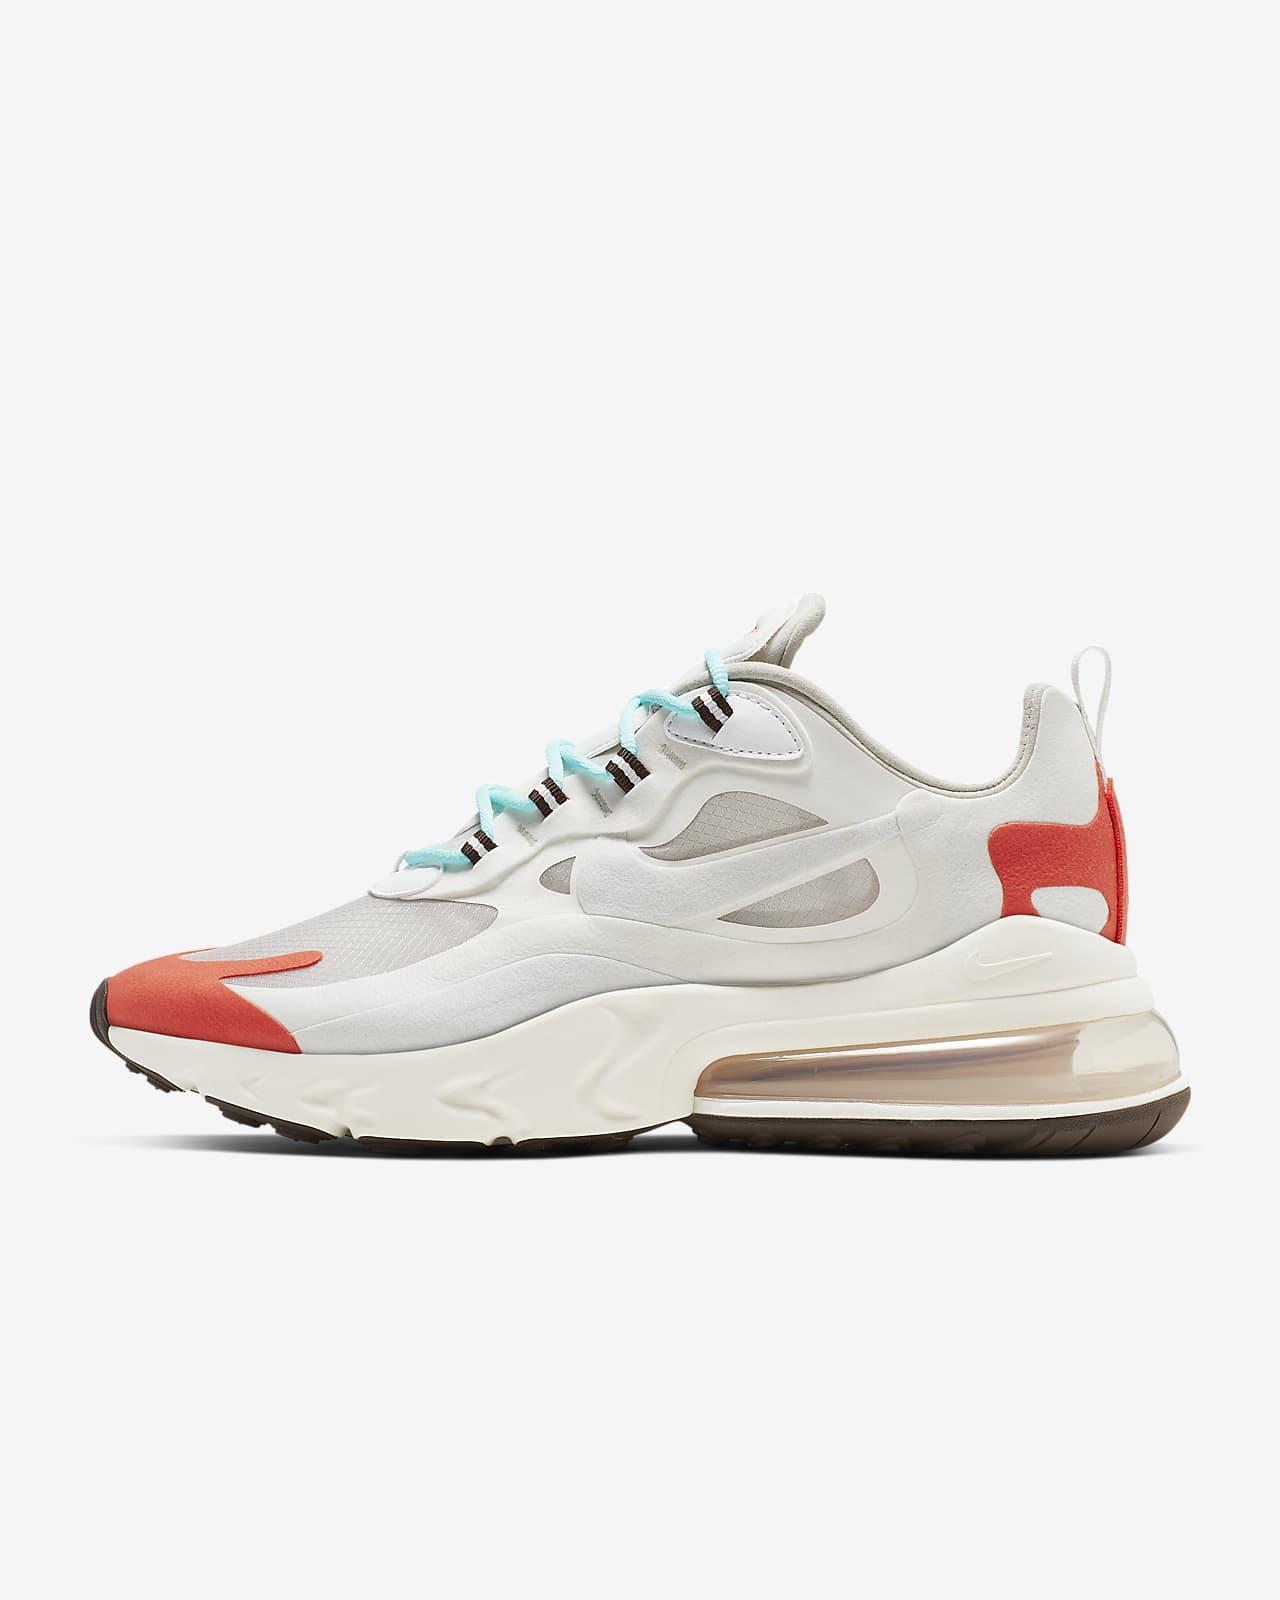 Nike Air Max 270 React (Mid-Century Art) Men's Shoes